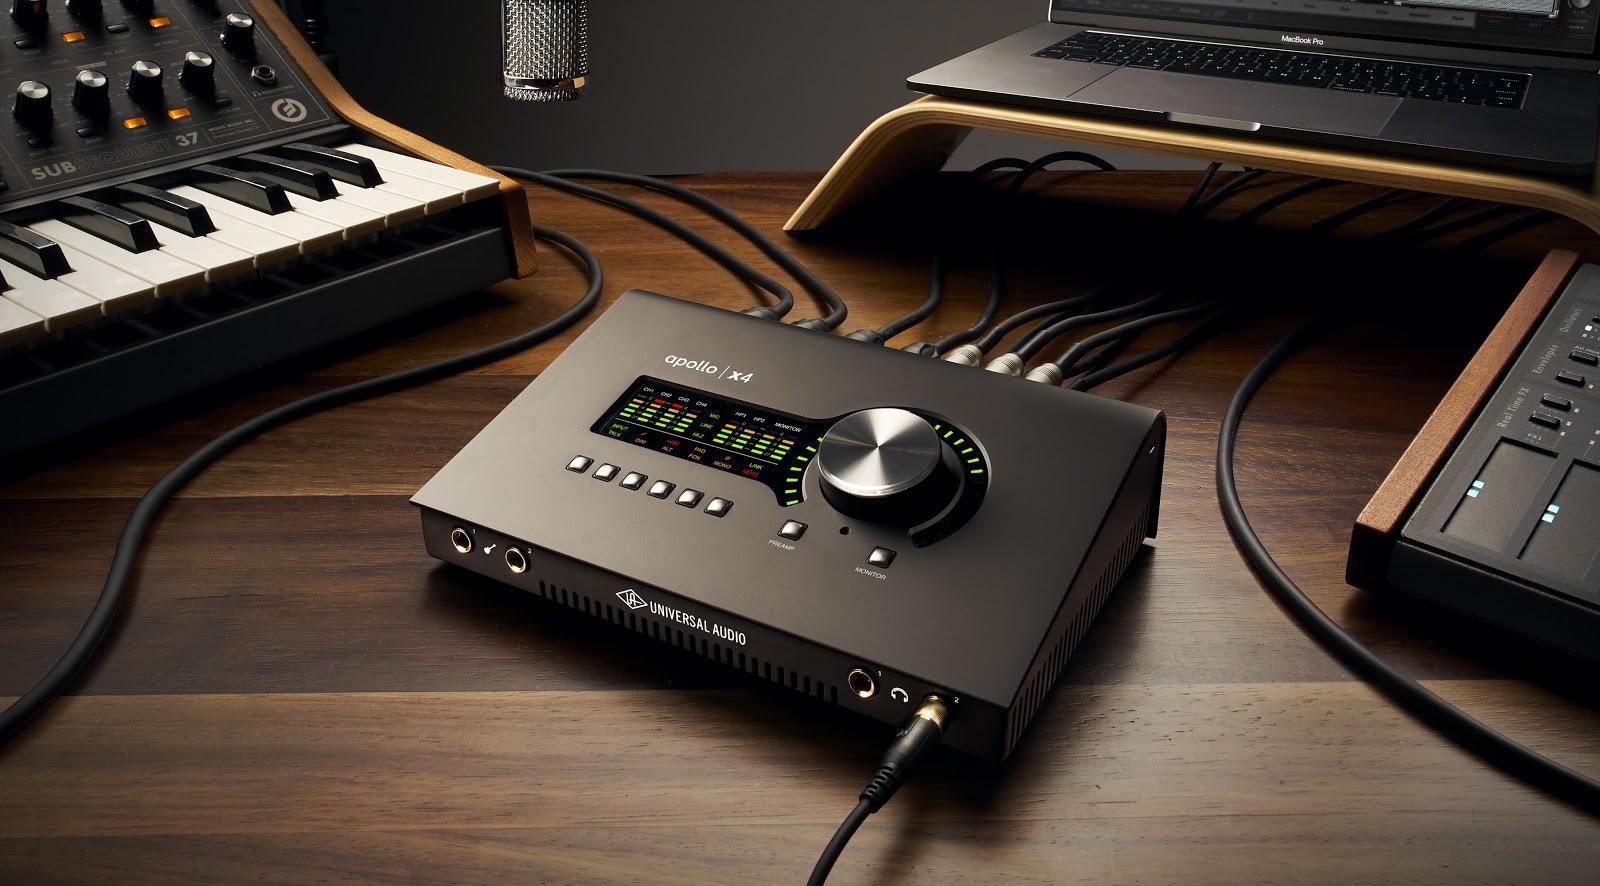 Universal Audio announce new Apollo Twin X and x4